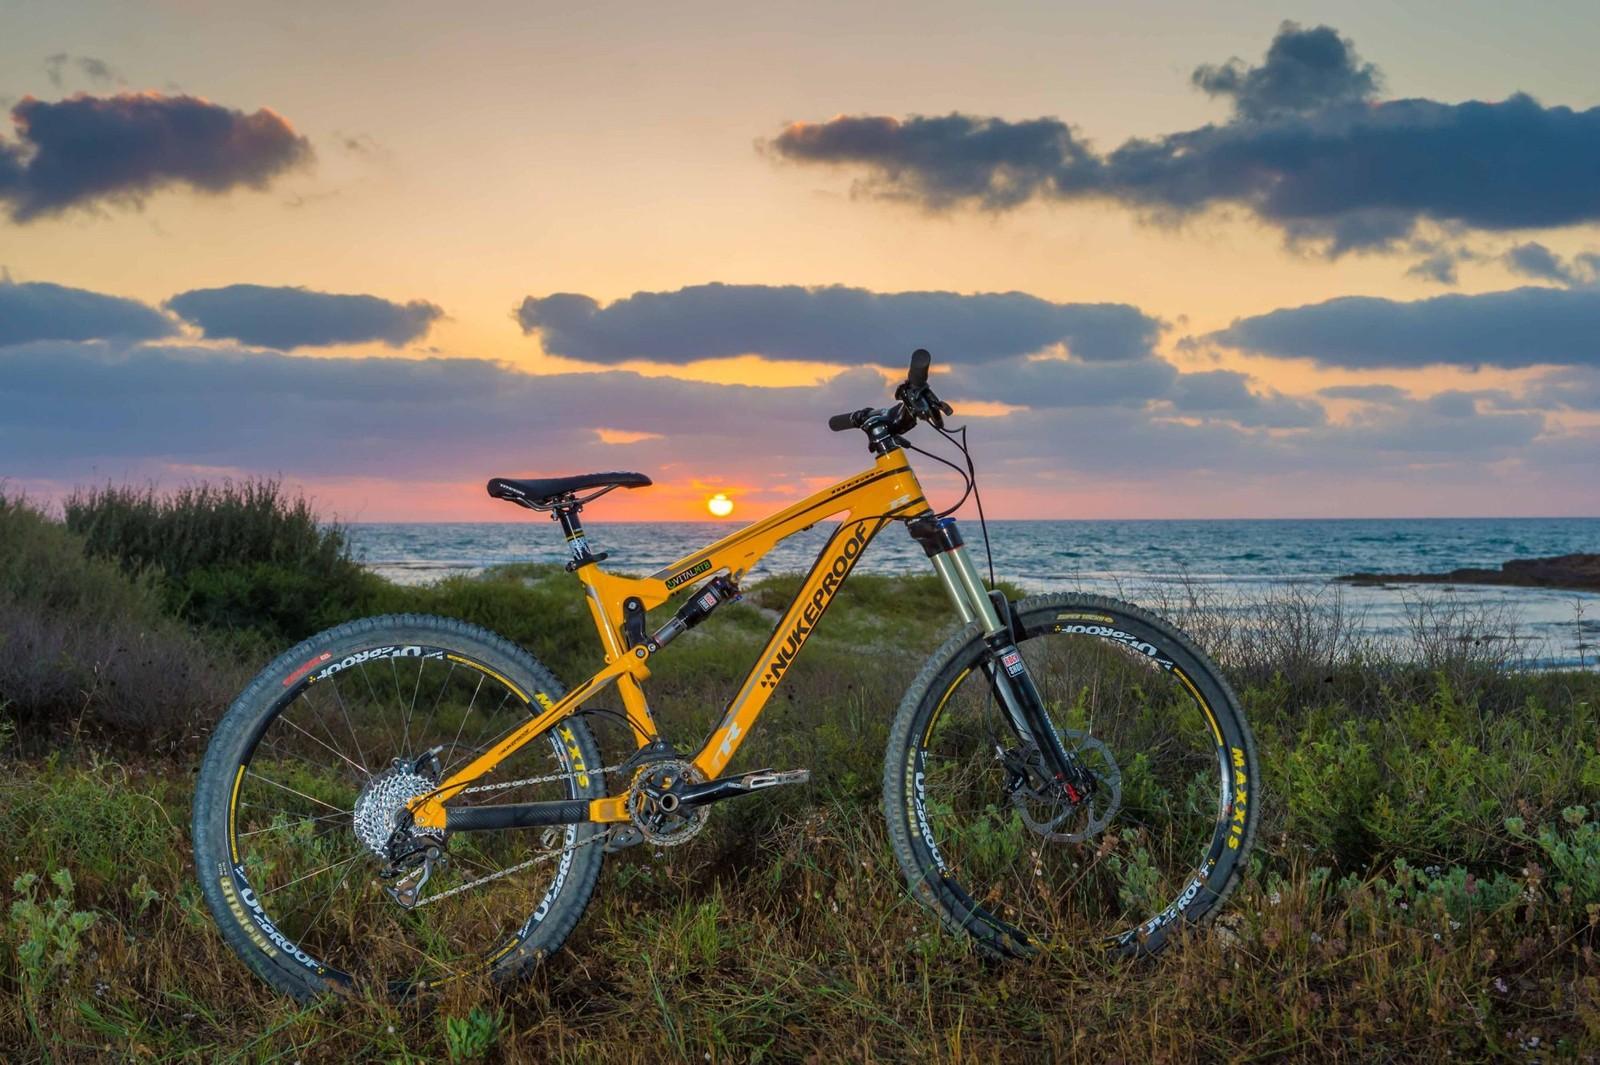 2013 Nukeproof Mega TR - Sunset - iceman2058 - Mountain Biking Pictures - Vital MTB